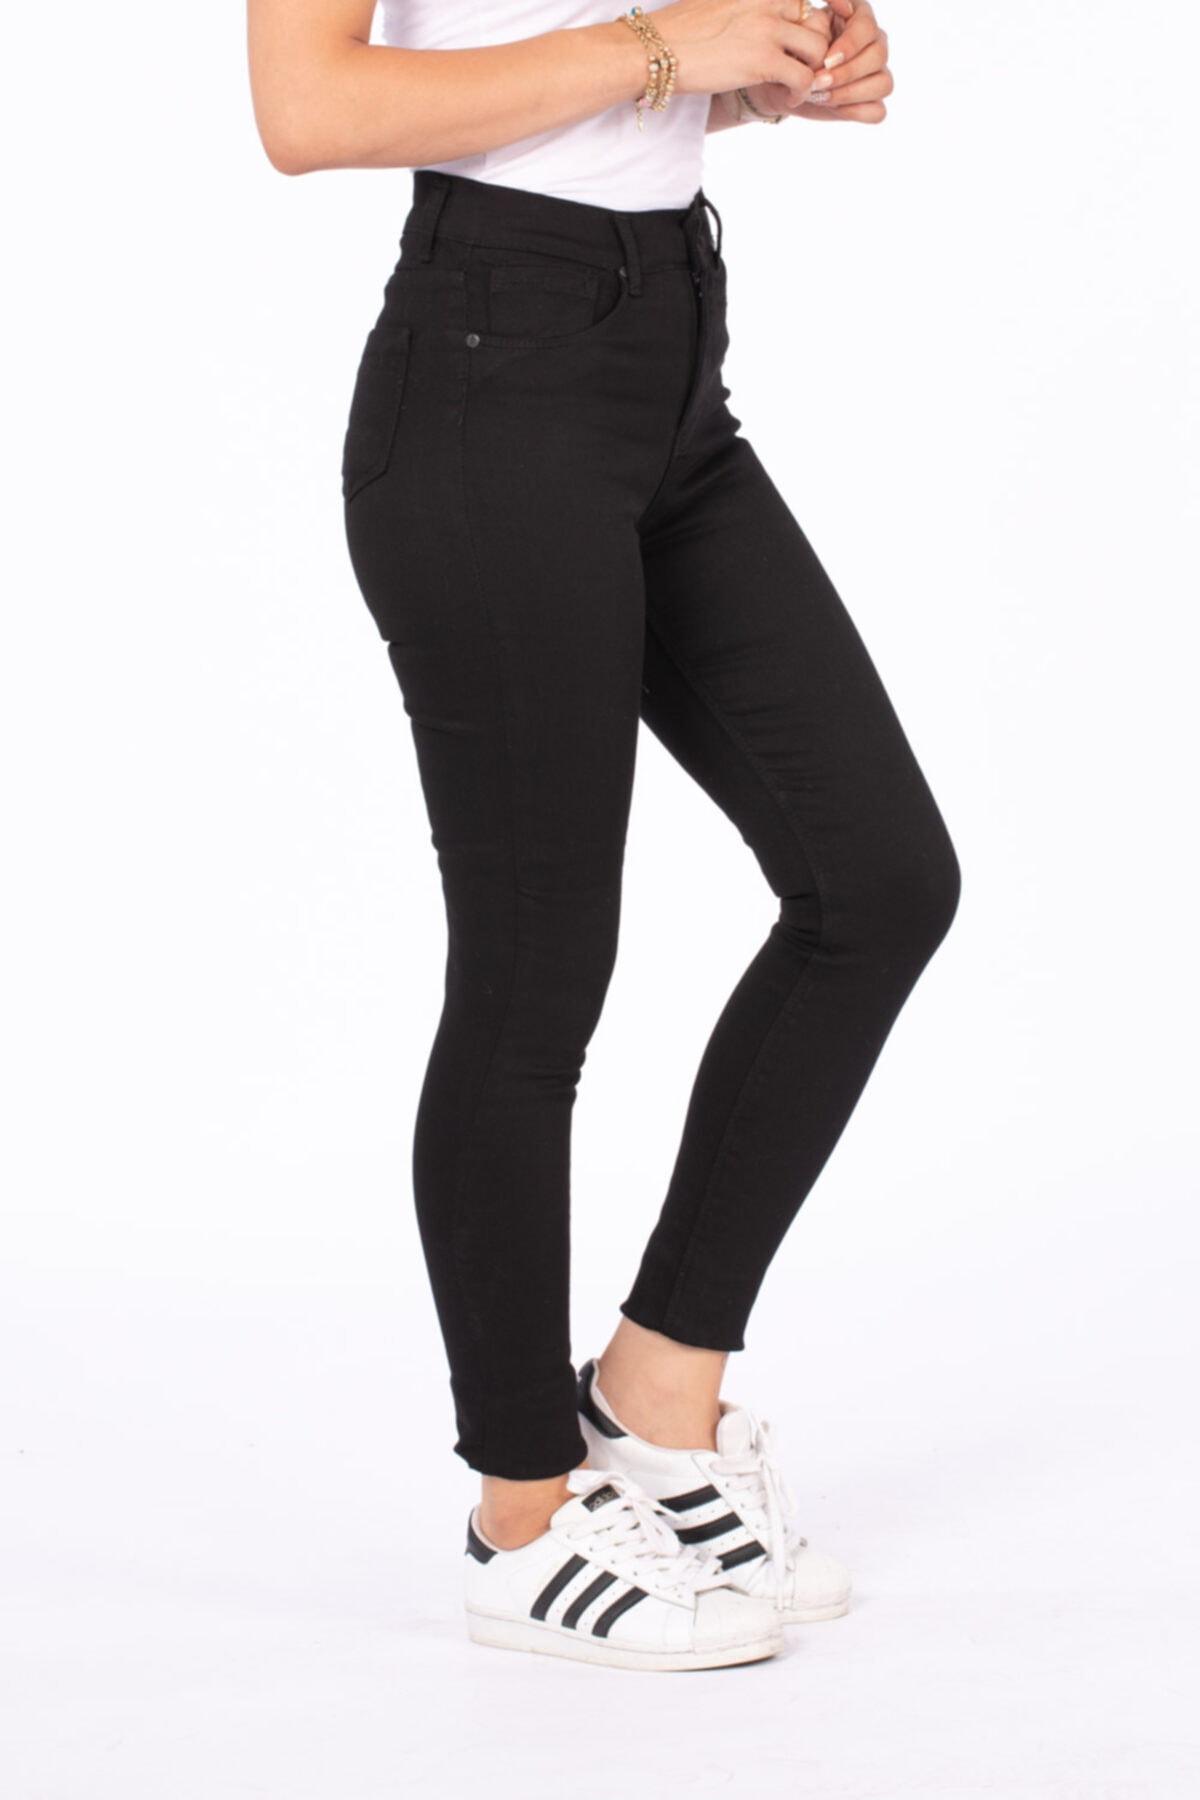 BARRELS AND OIL Kadın Siyah Yüksek Bel Pantolon 210 1